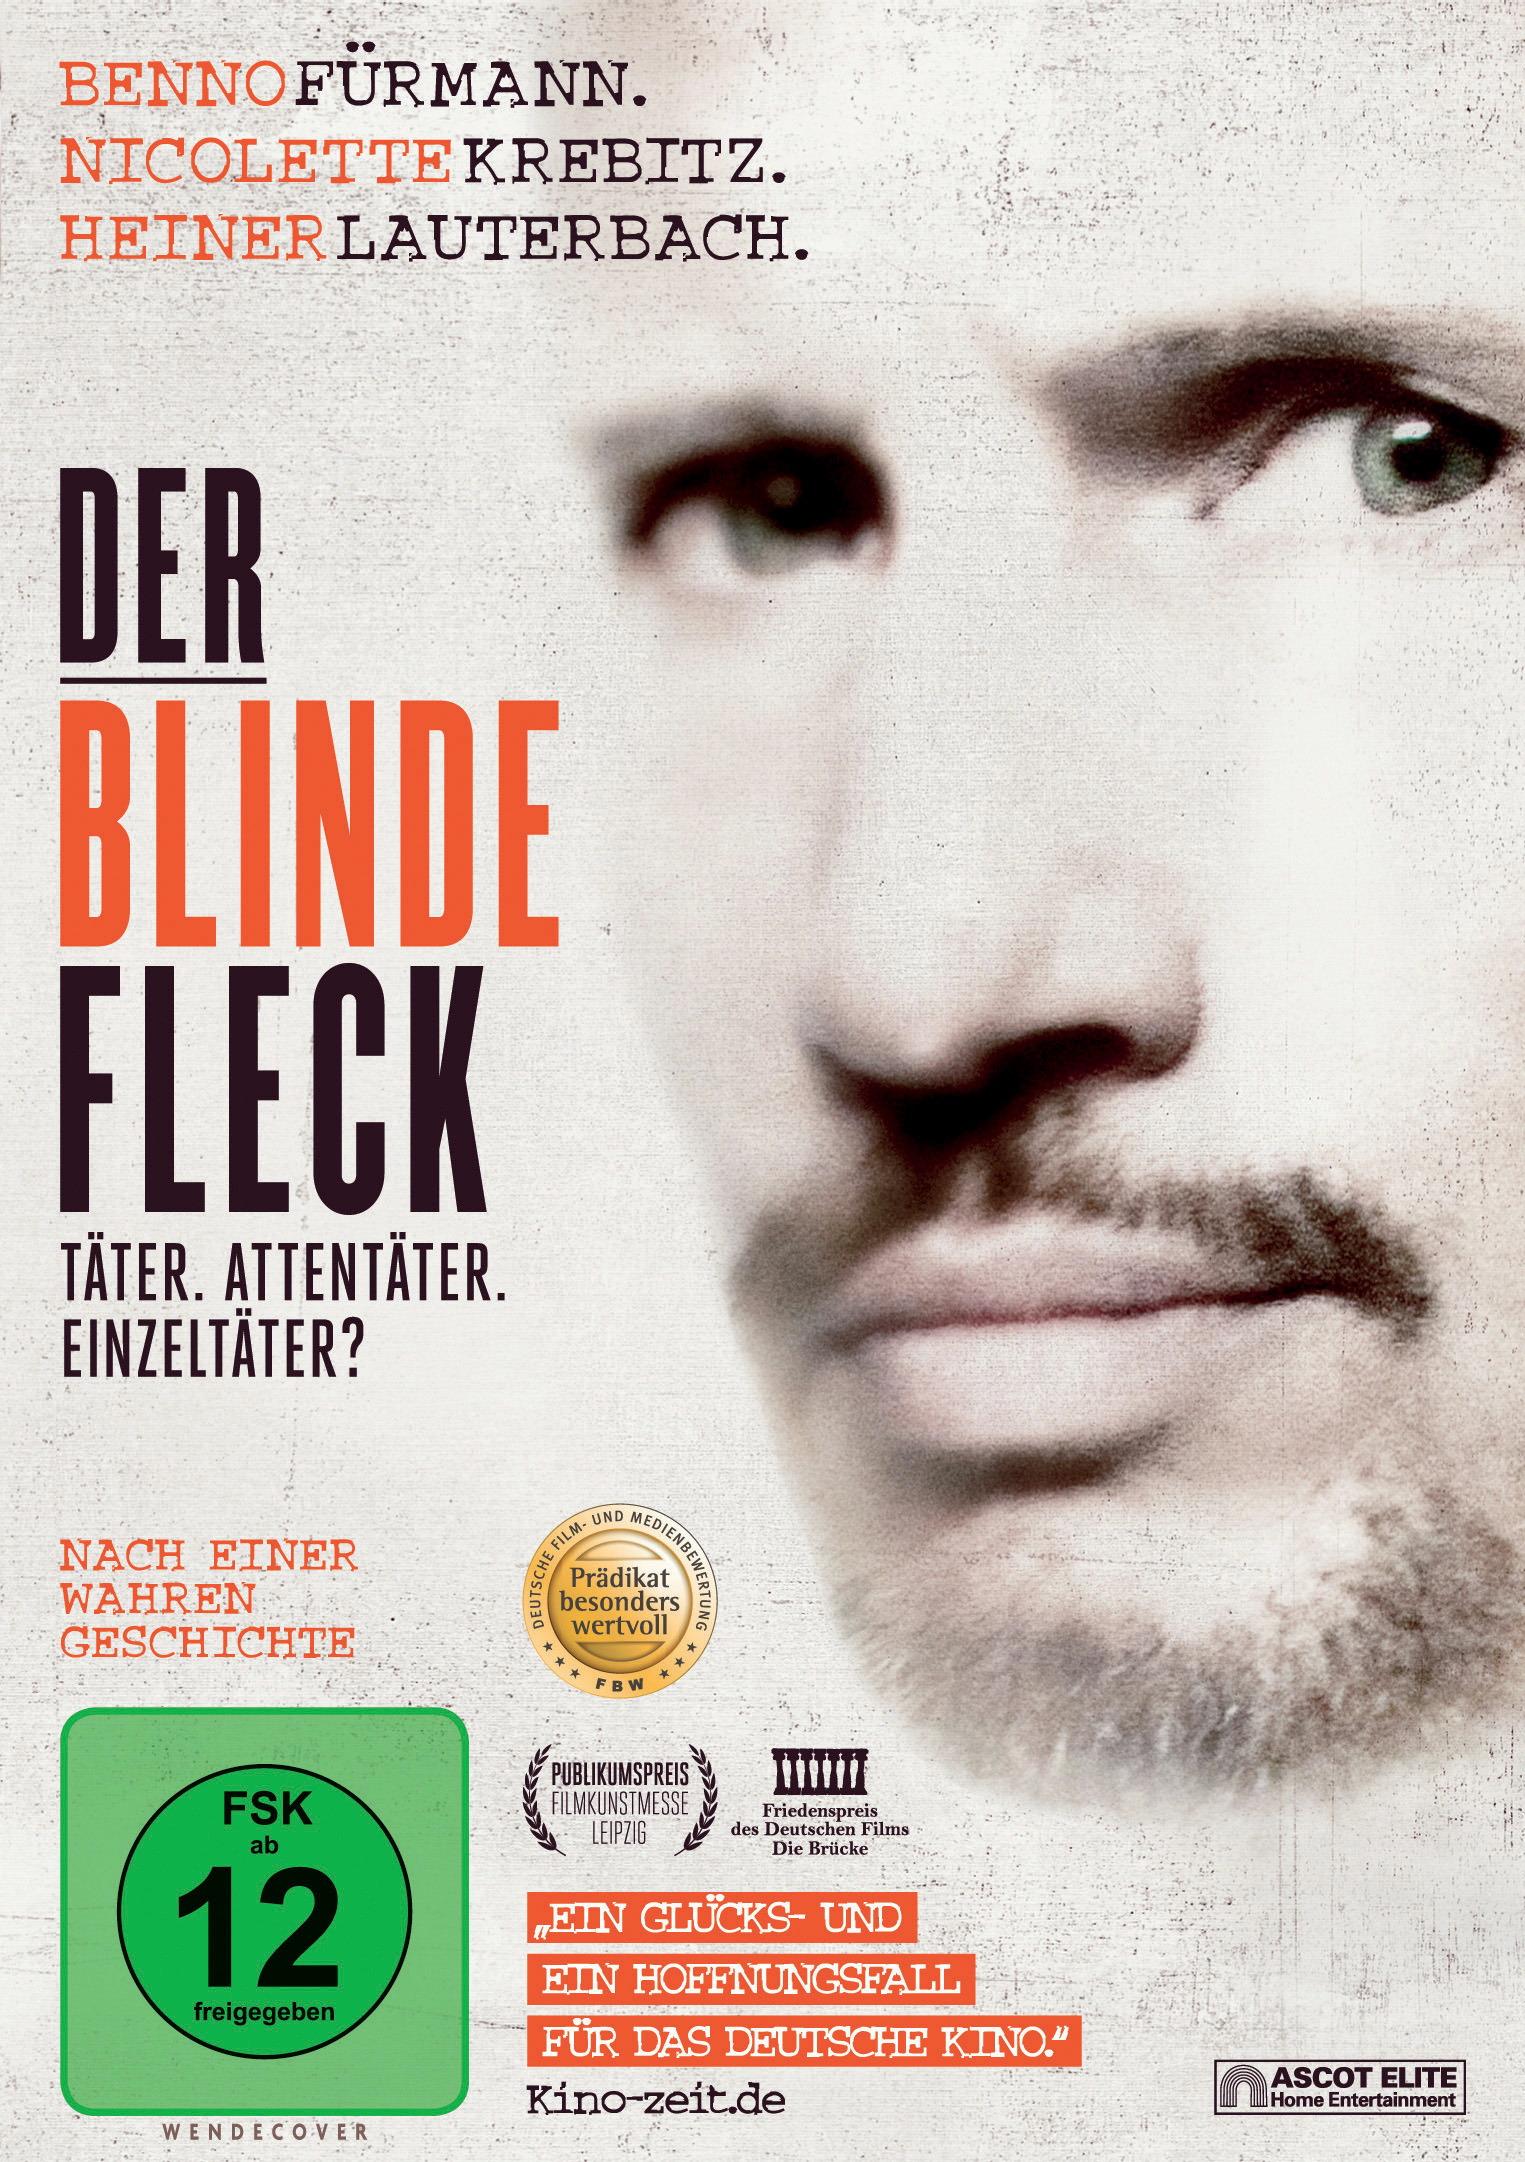 Der blinde Fleck - Täter. Attentäter. Einzeltäter? Poster